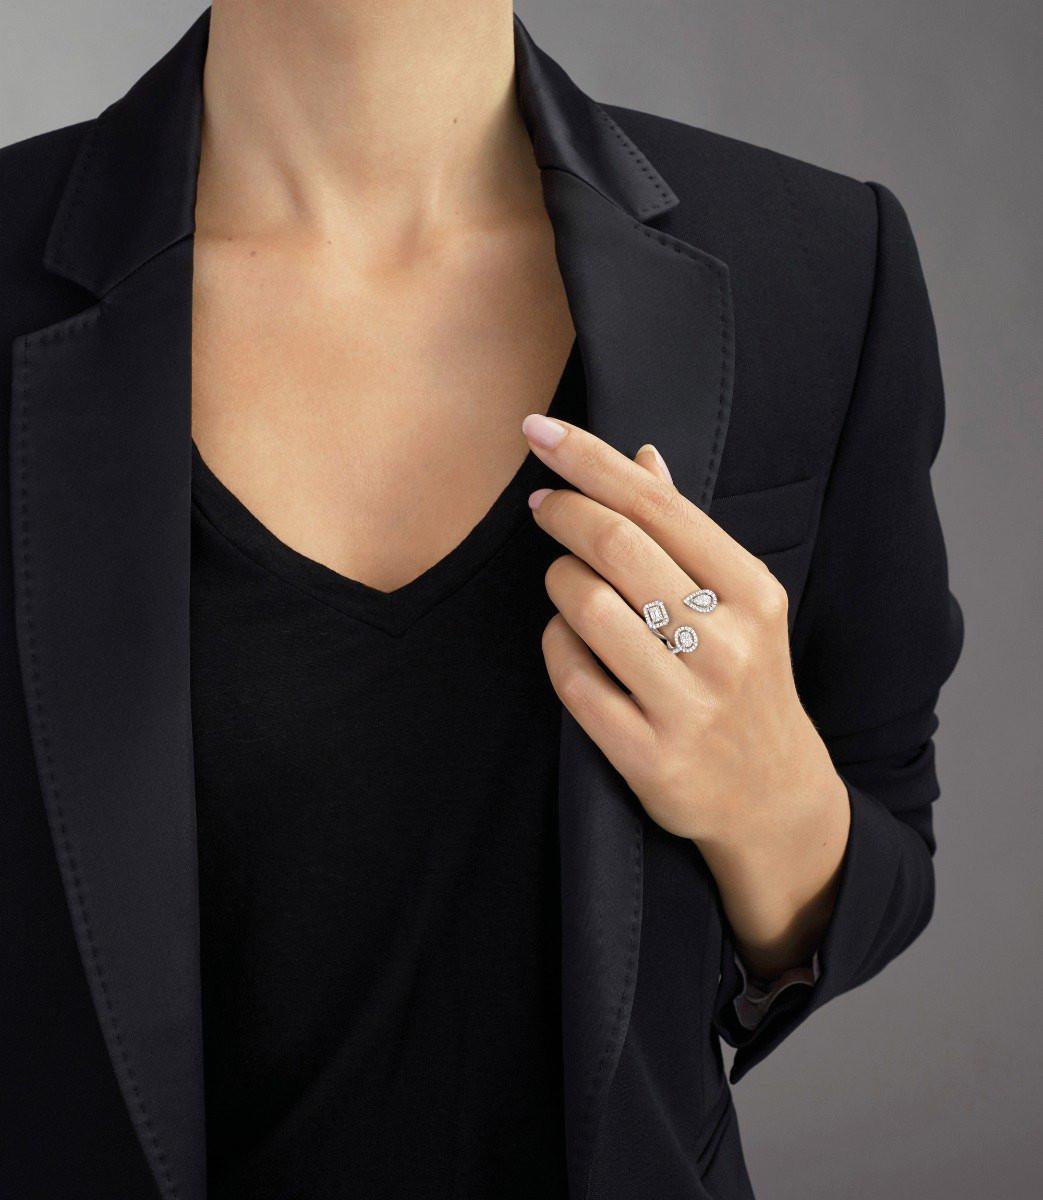 My Twin Trilogy Diamond Ring in 18K Gold on model